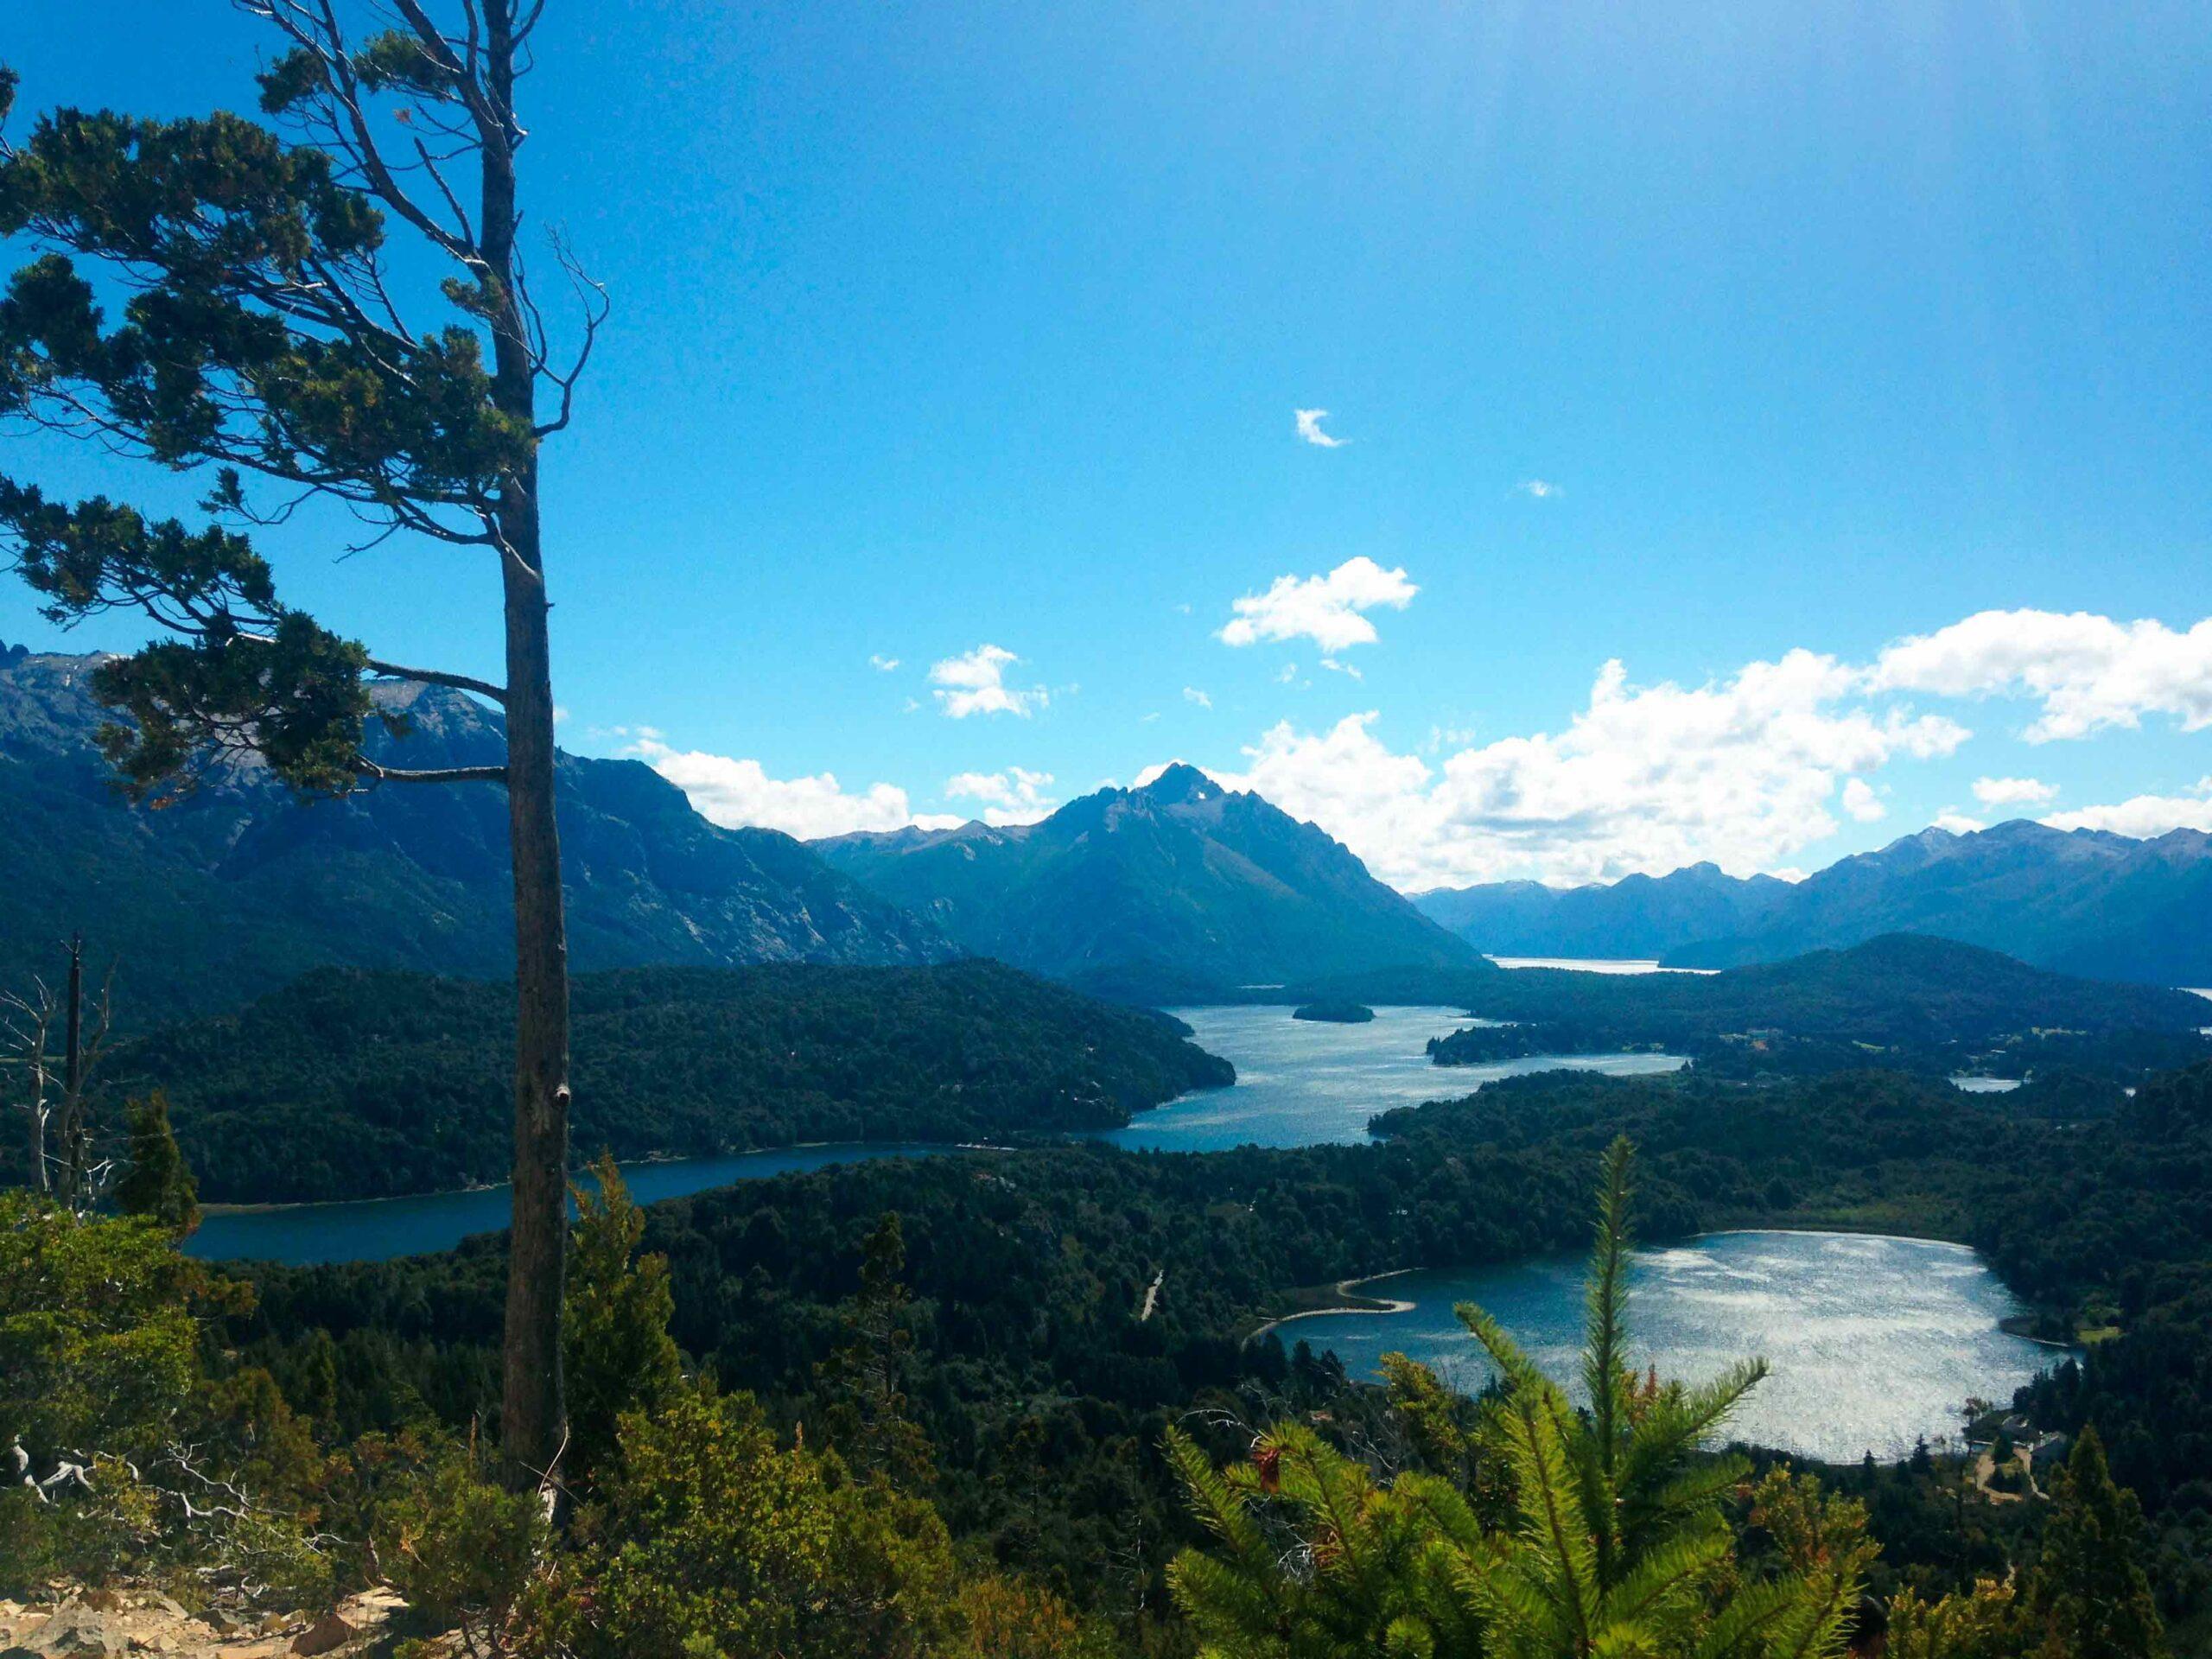 Lake views of Bariloche Argentina